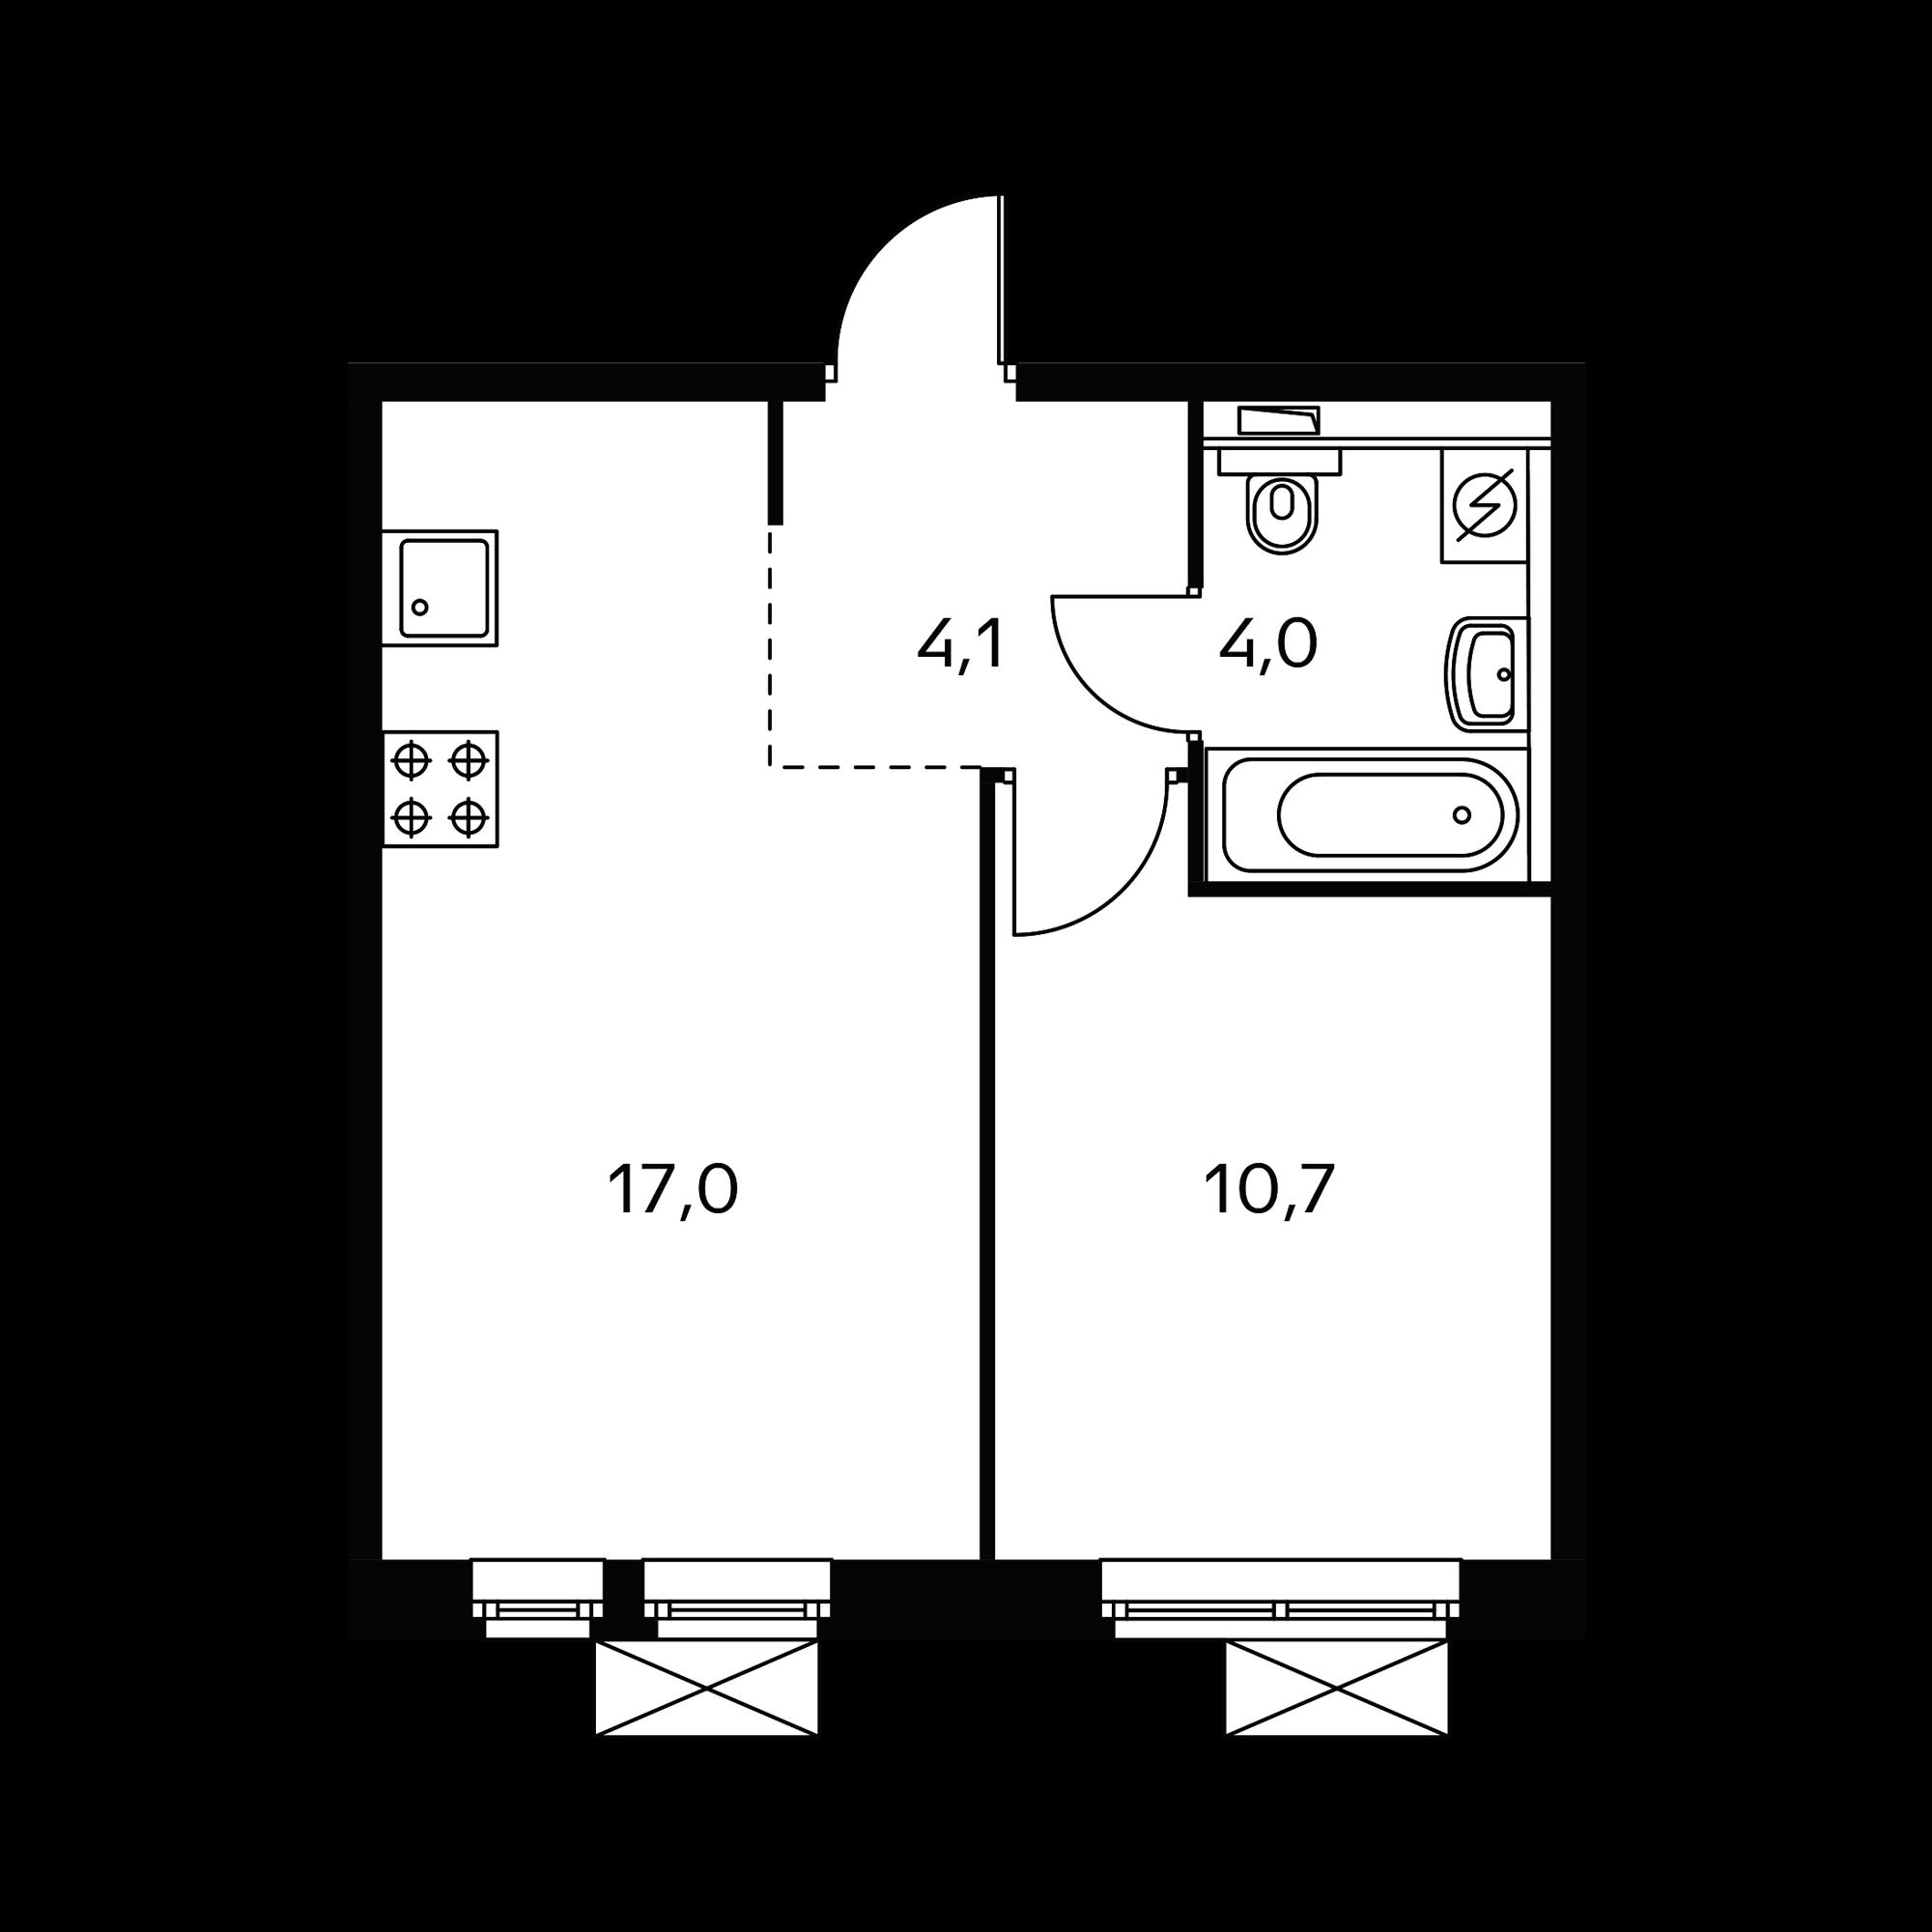 1ES4_6.3-1_S_Z